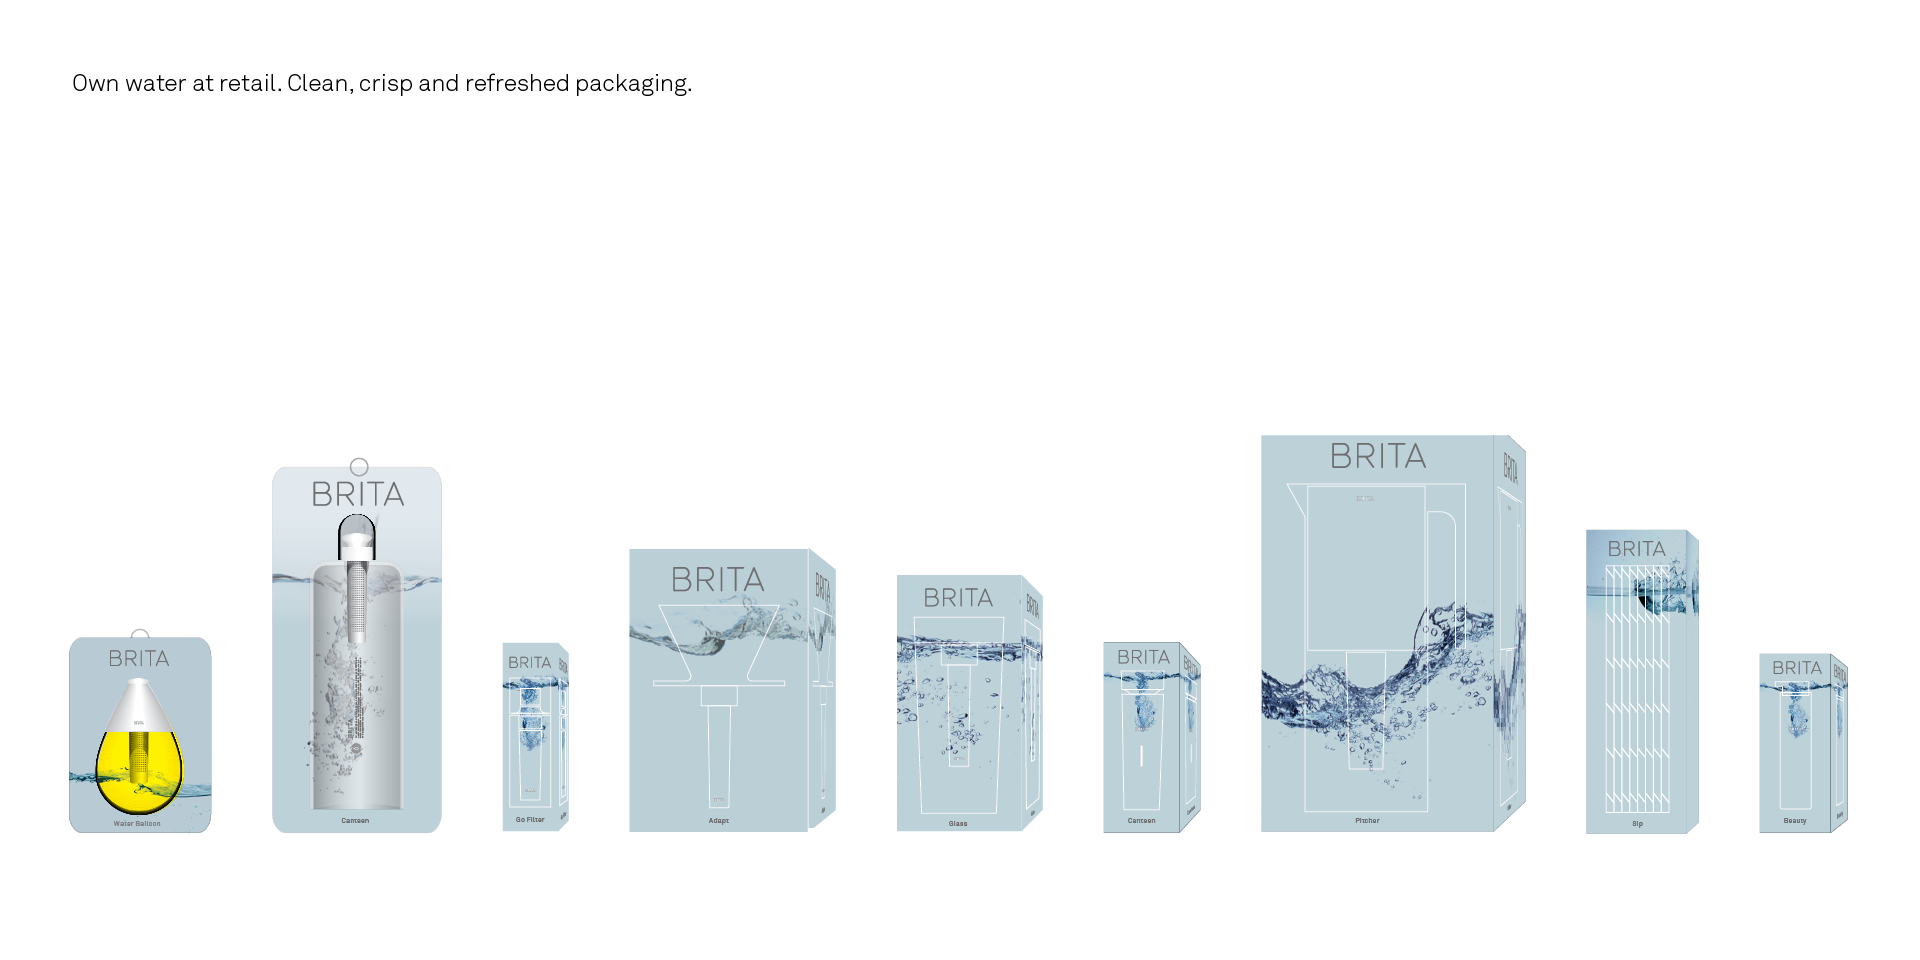 BRITA2-0057.jpg